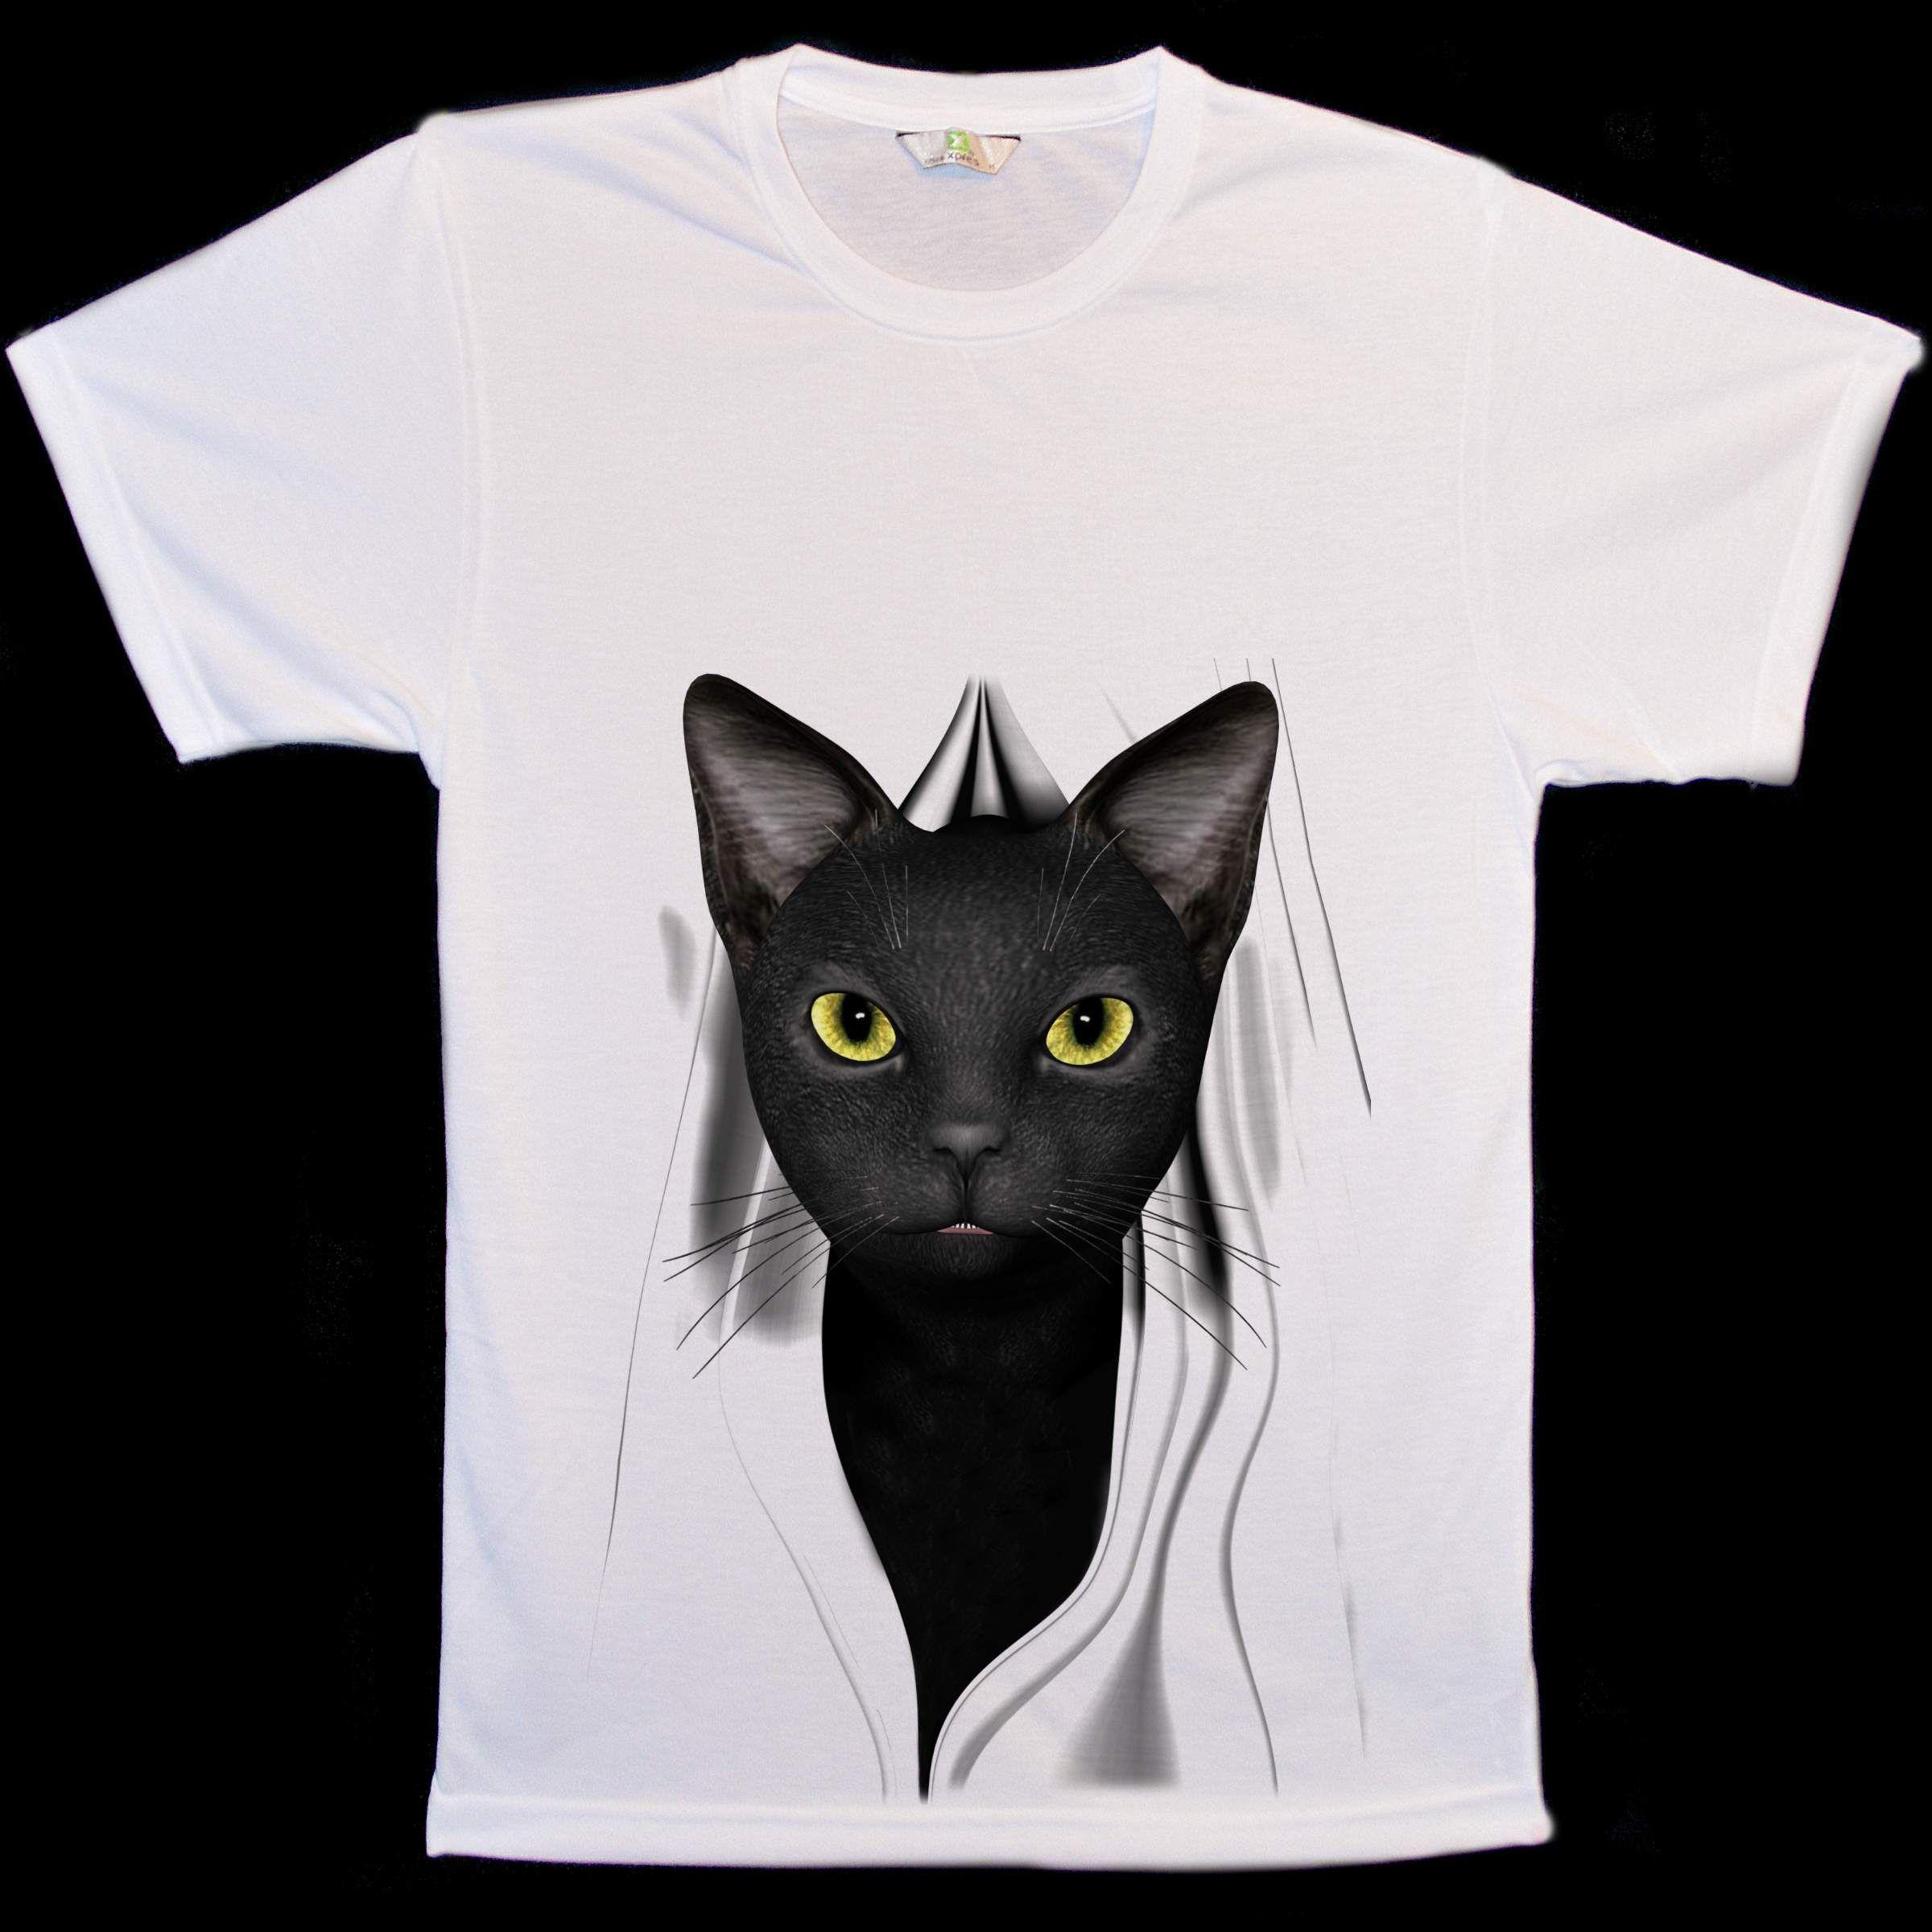 Animal Face Black Cat Peep T Shirts